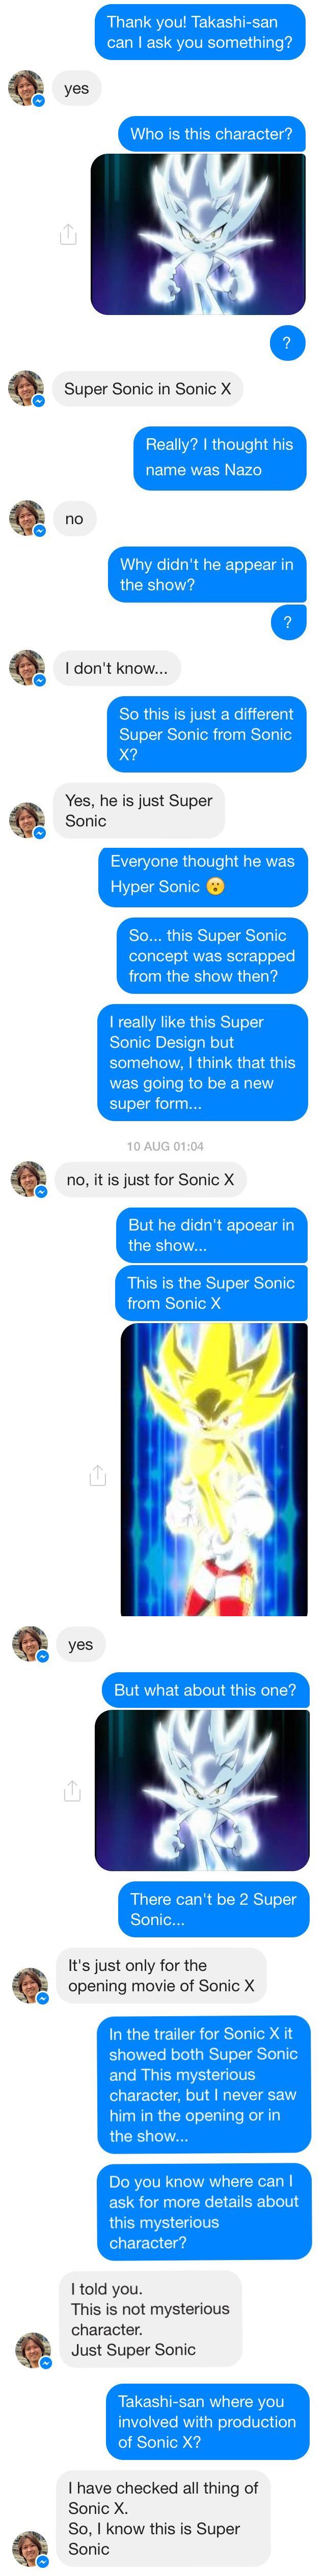 nazo conversation